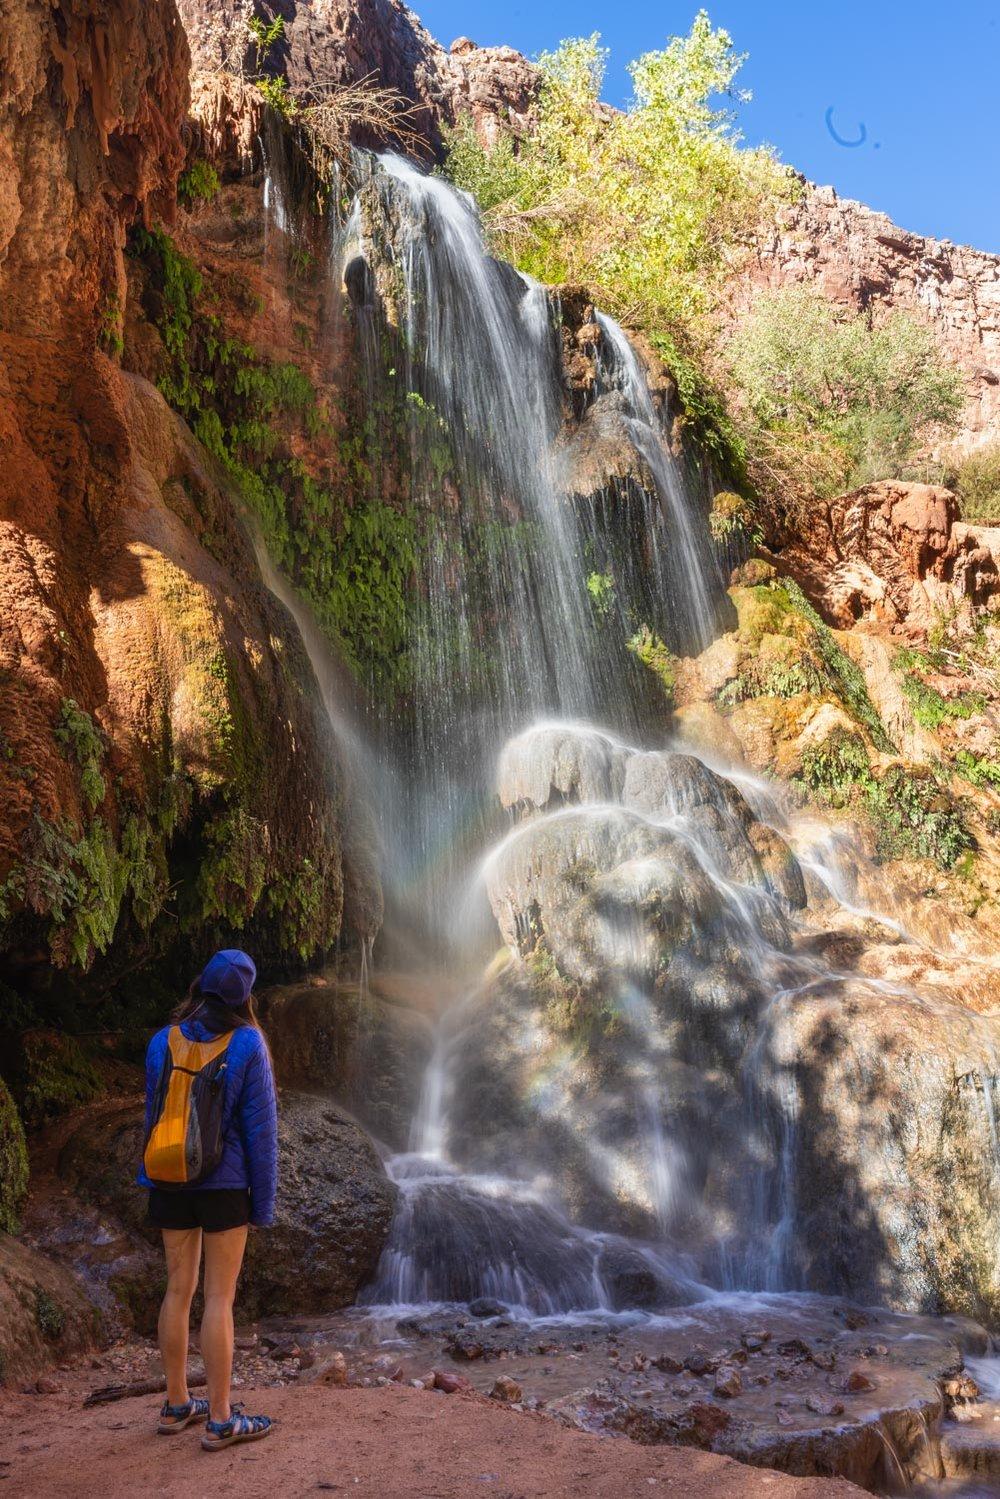 Discovering a mini waterfall